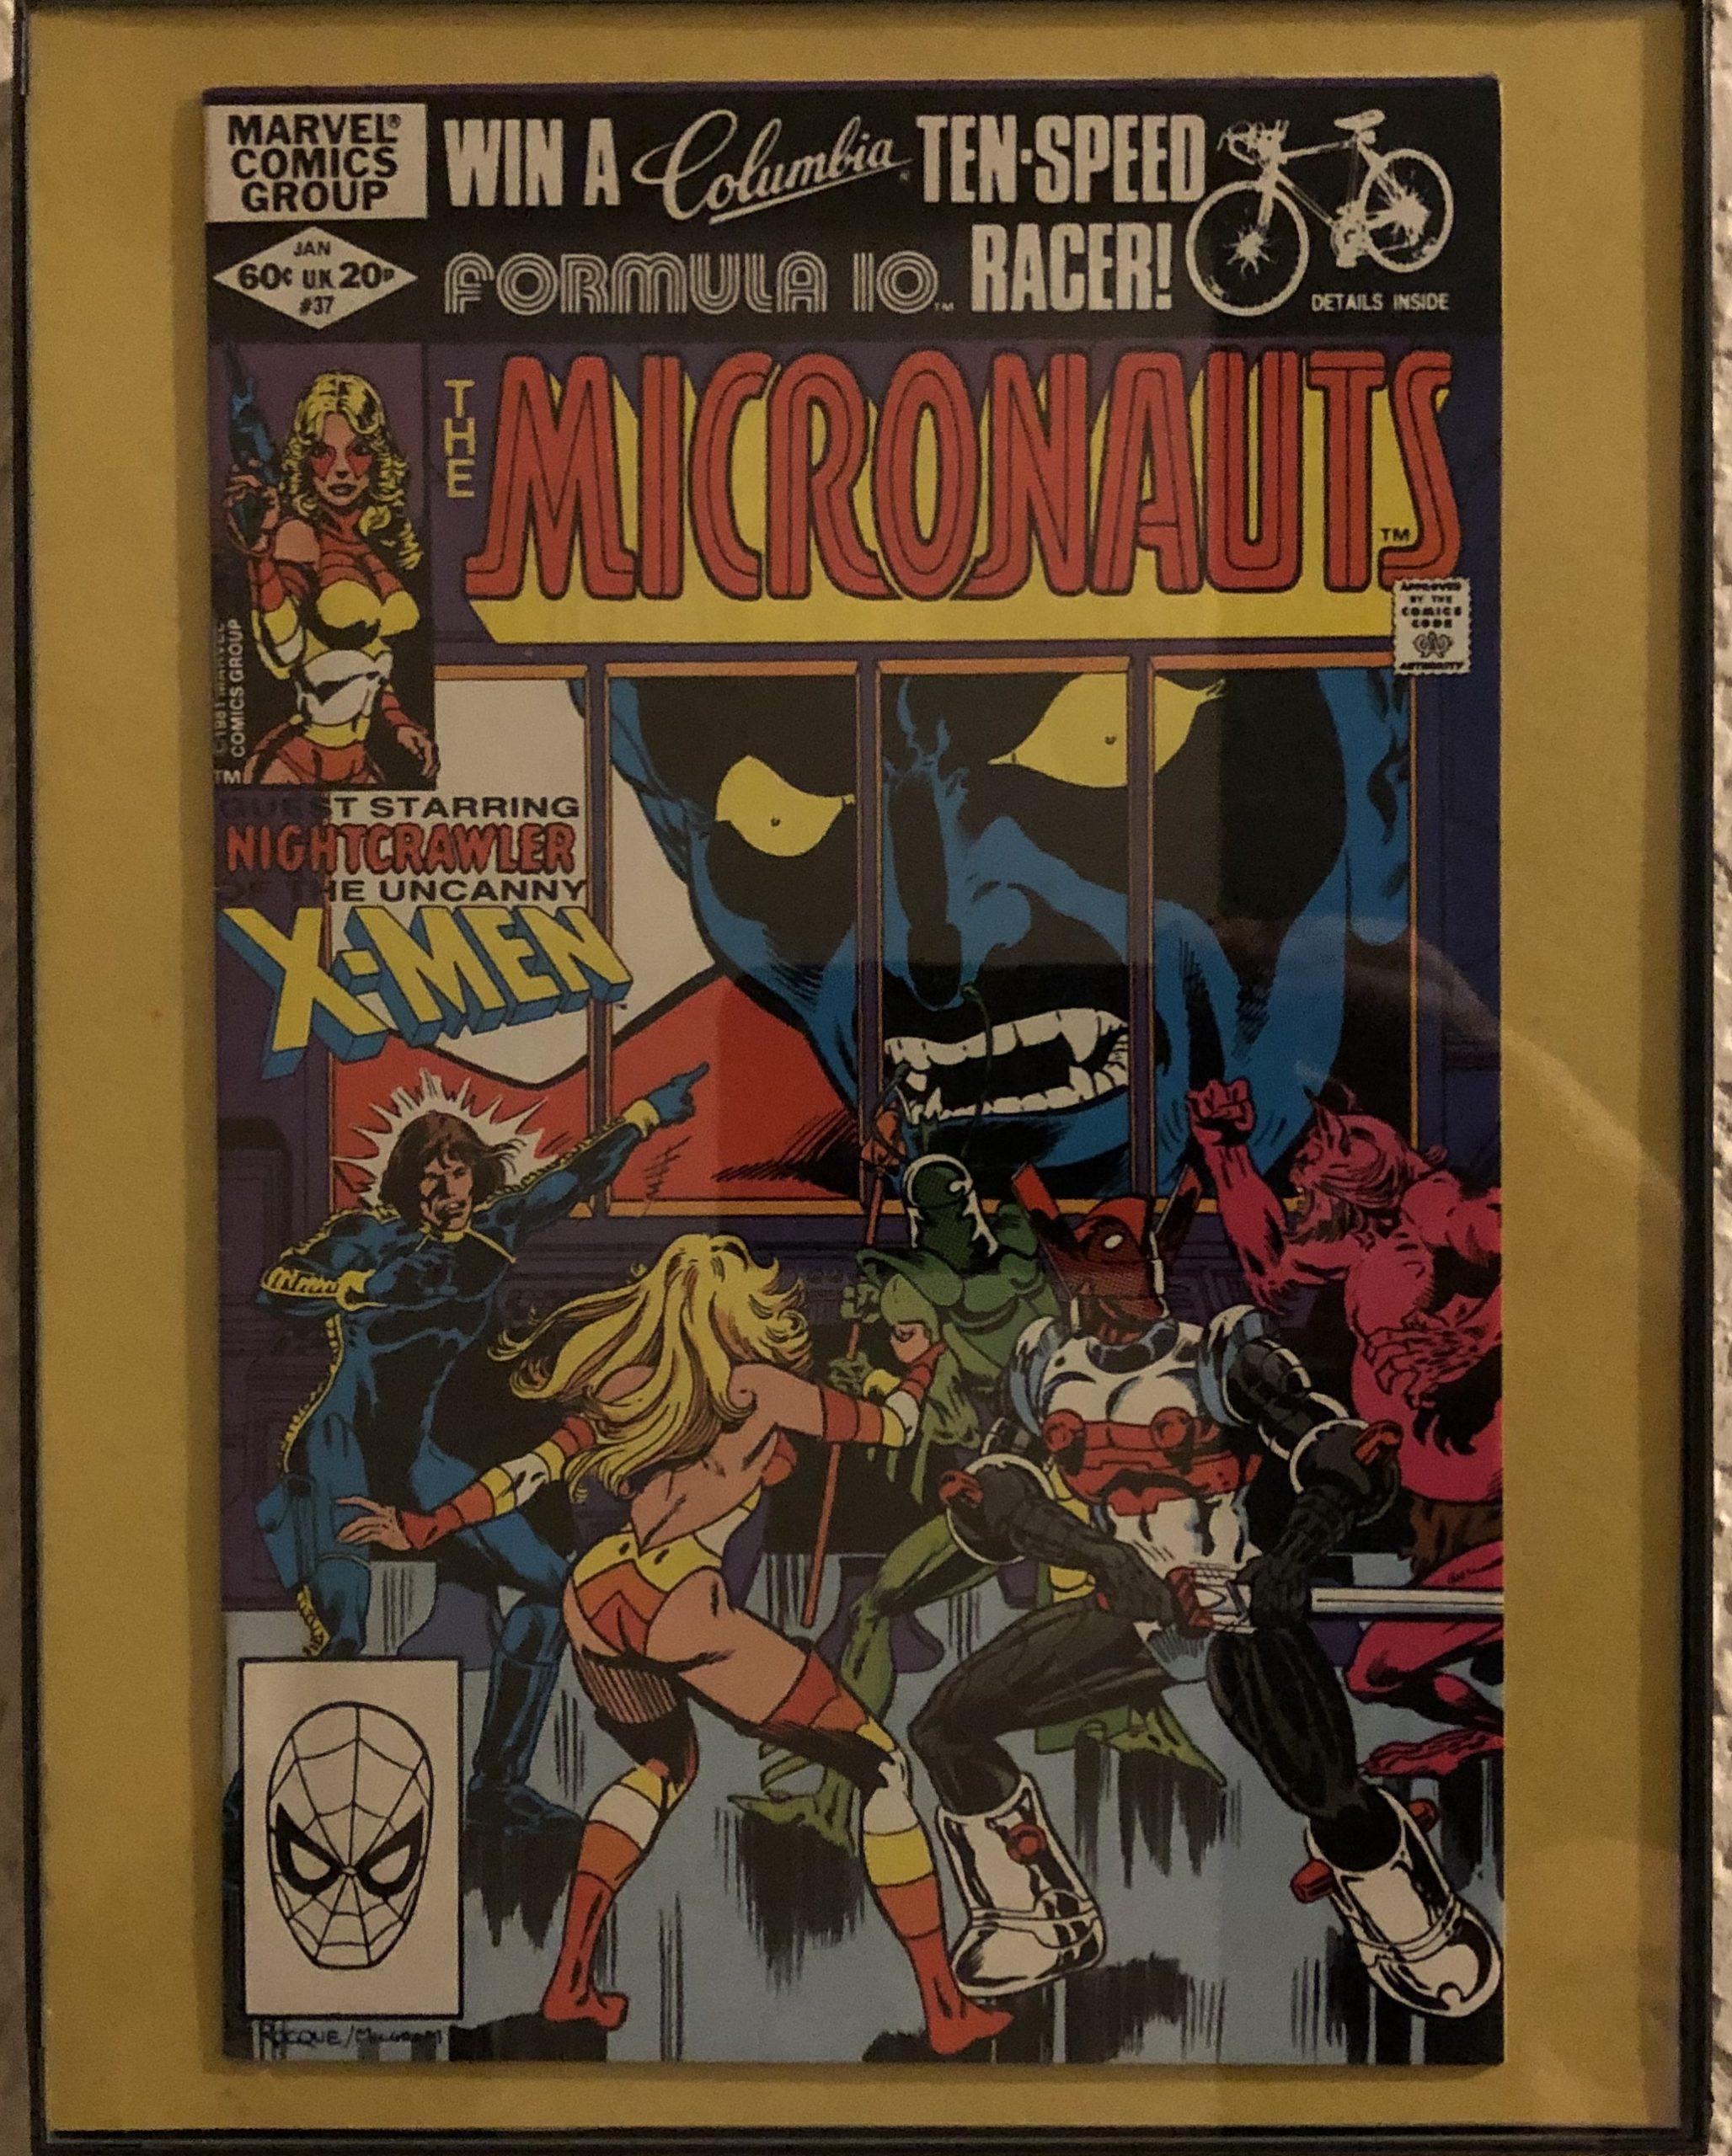 Micronauts 37 (Greg_LaRocque/Al Milgrom)